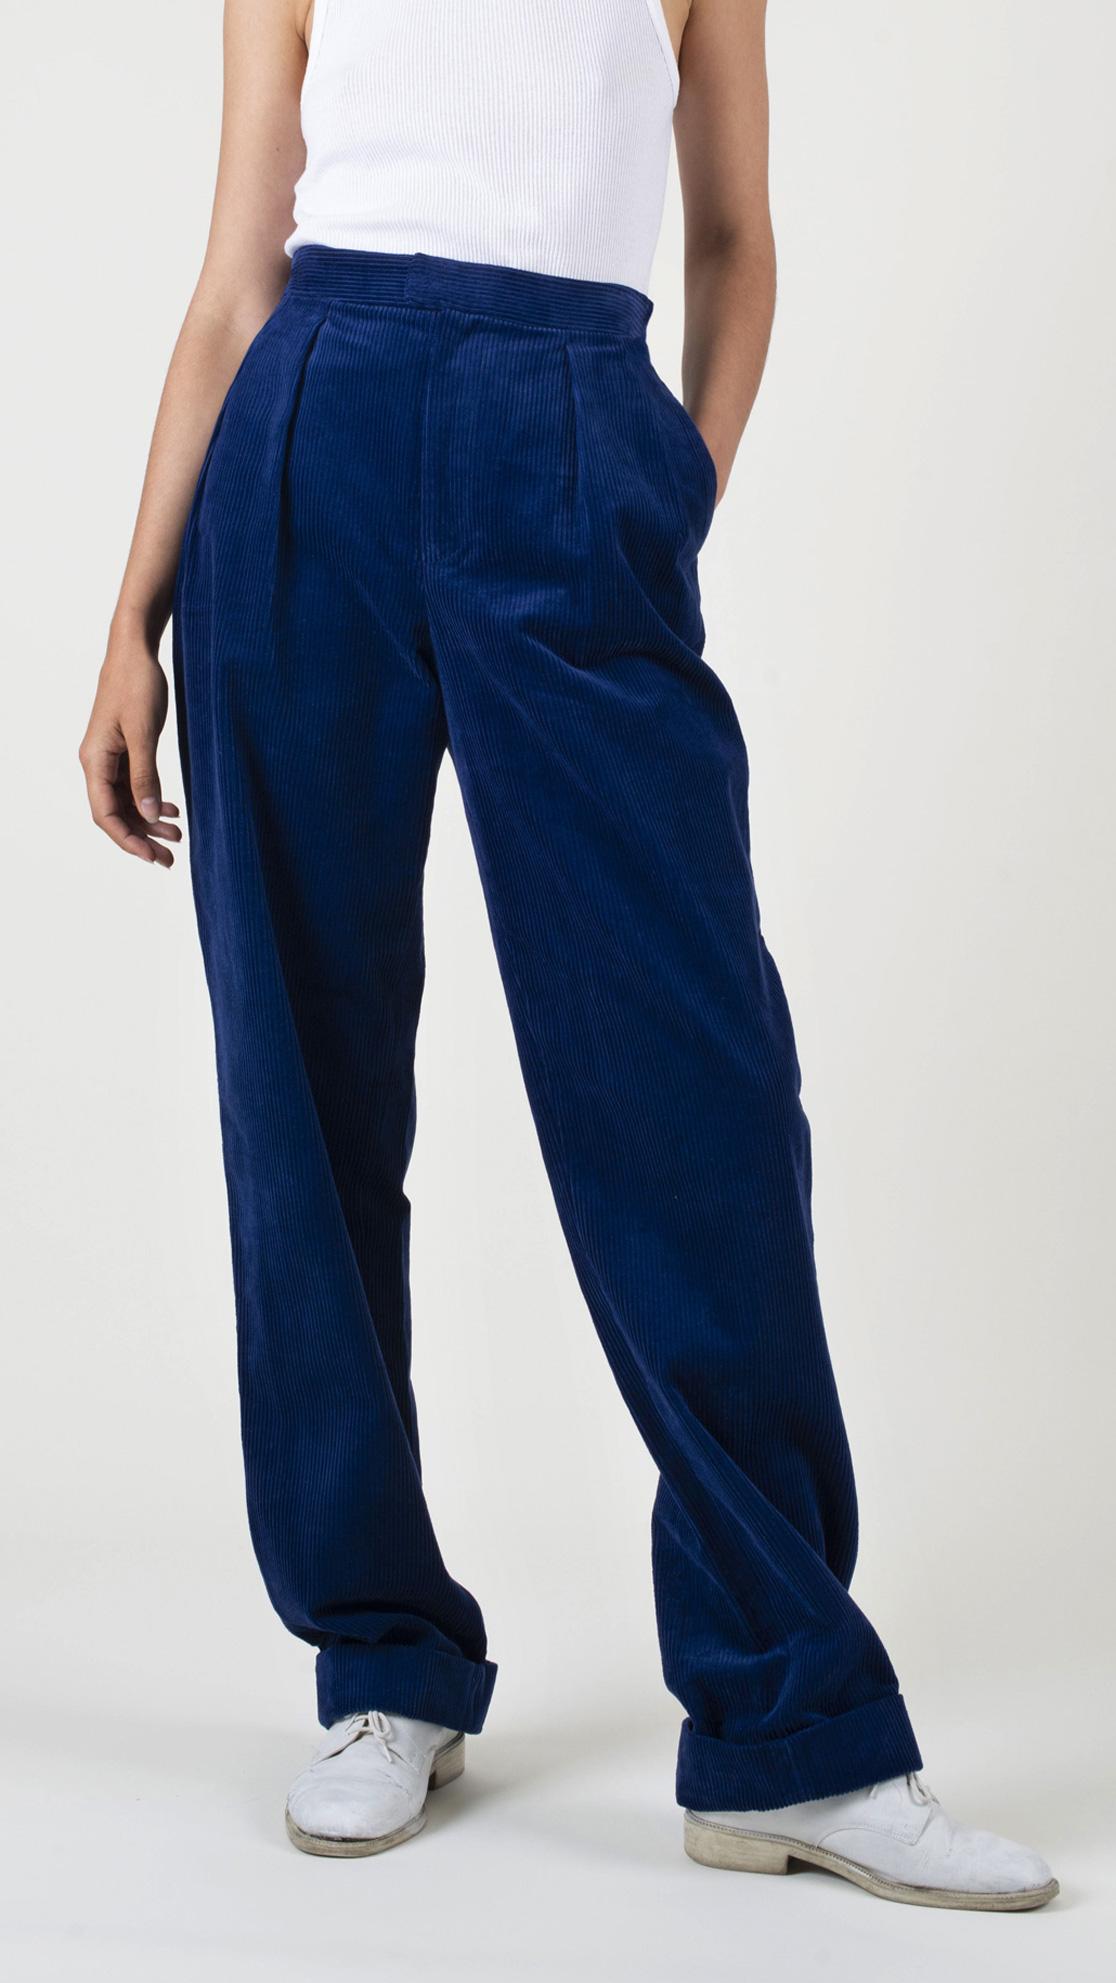 DADA-Diane-Ducasse-AH21-pantalon-droit-jules-velours-bleu-roi-face